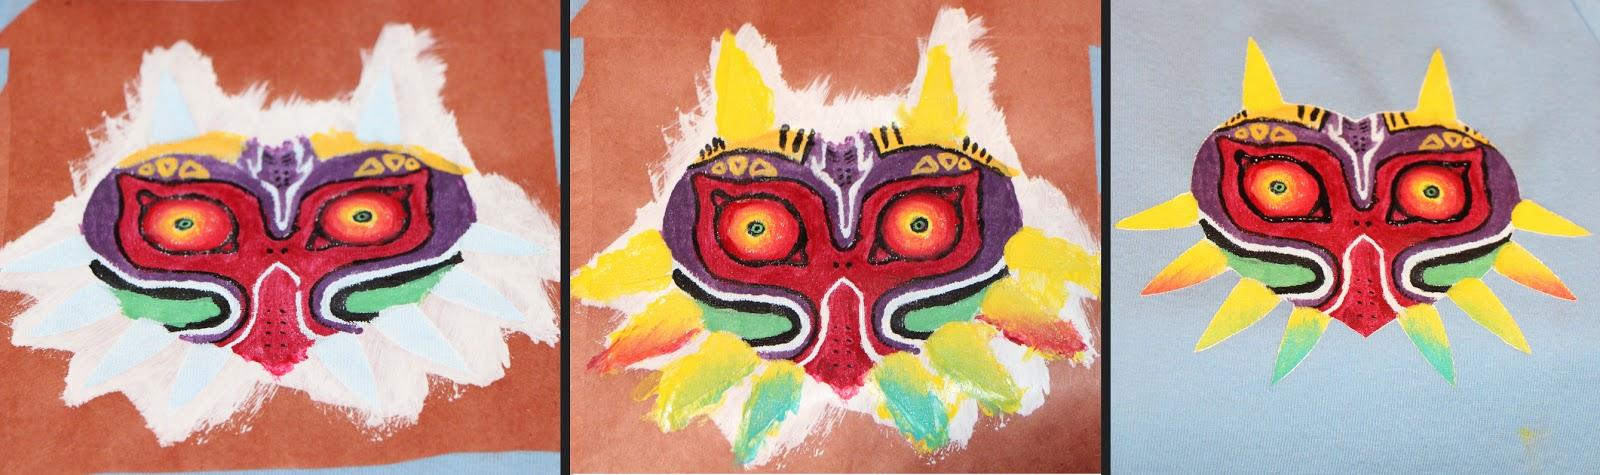 Majora's Mask Colouring